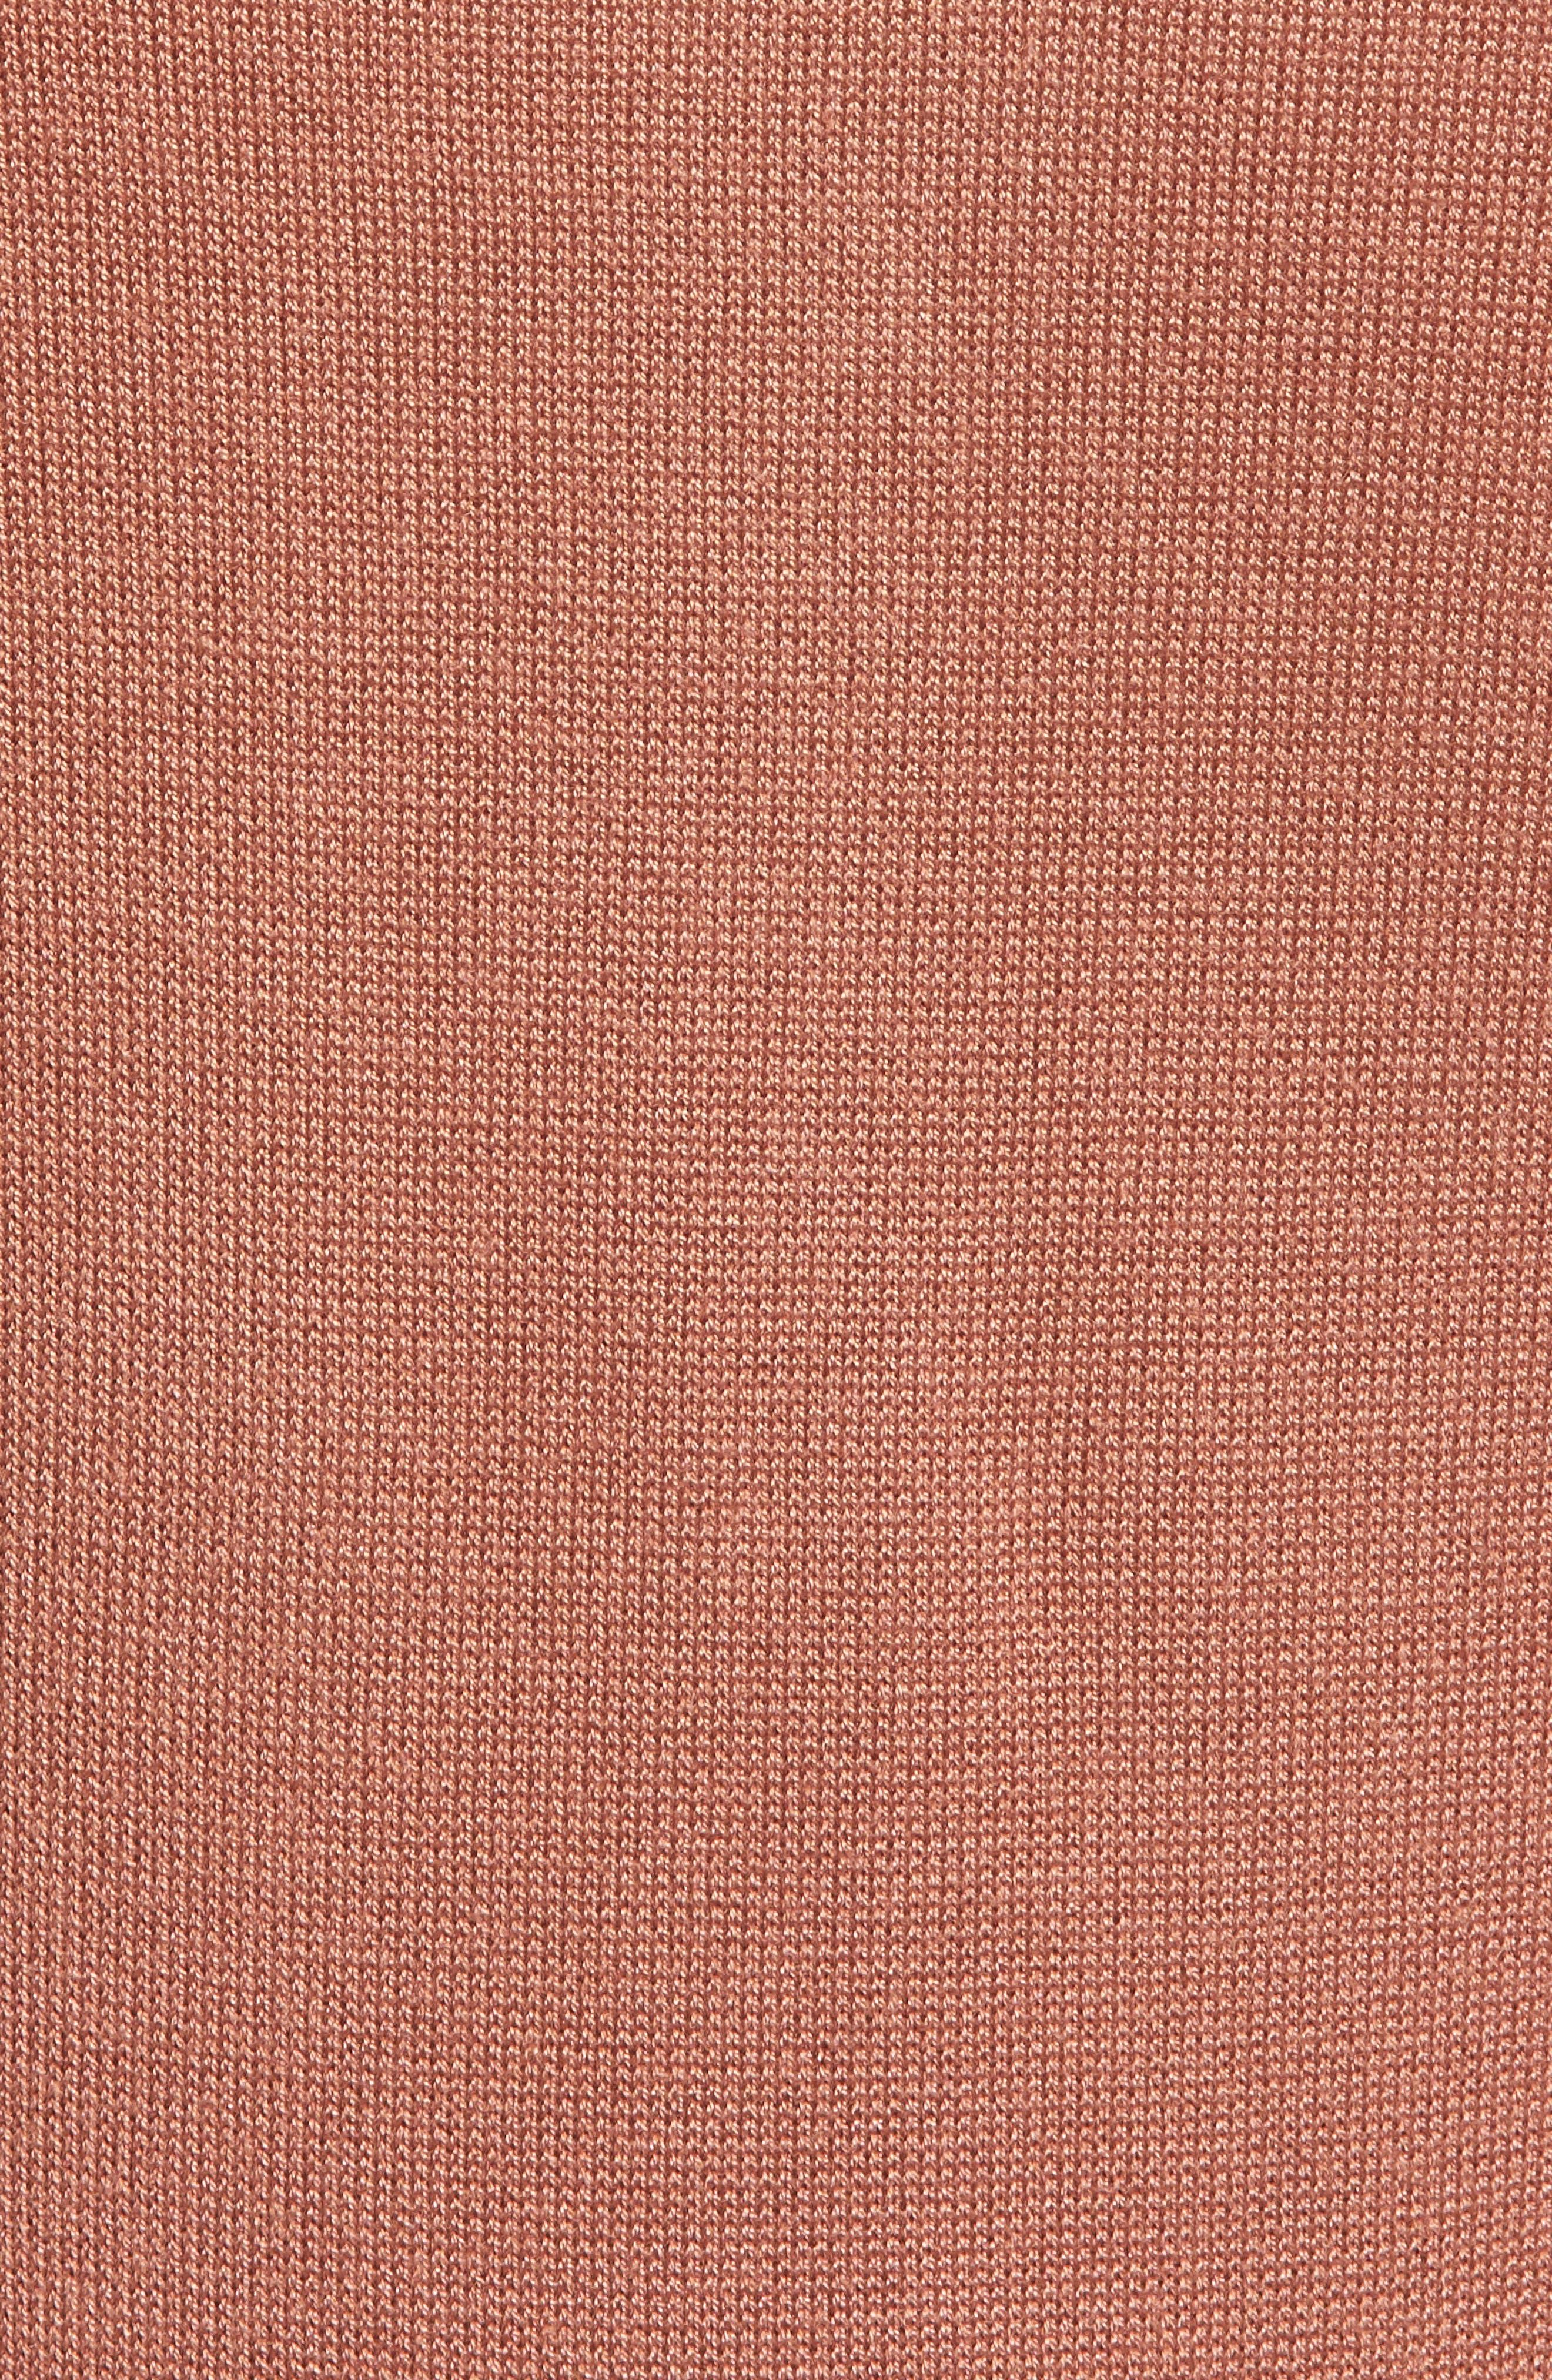 Ladder Inset Sweater Dress,                             Alternate thumbnail 6, color,                             VINTAGE ROSE